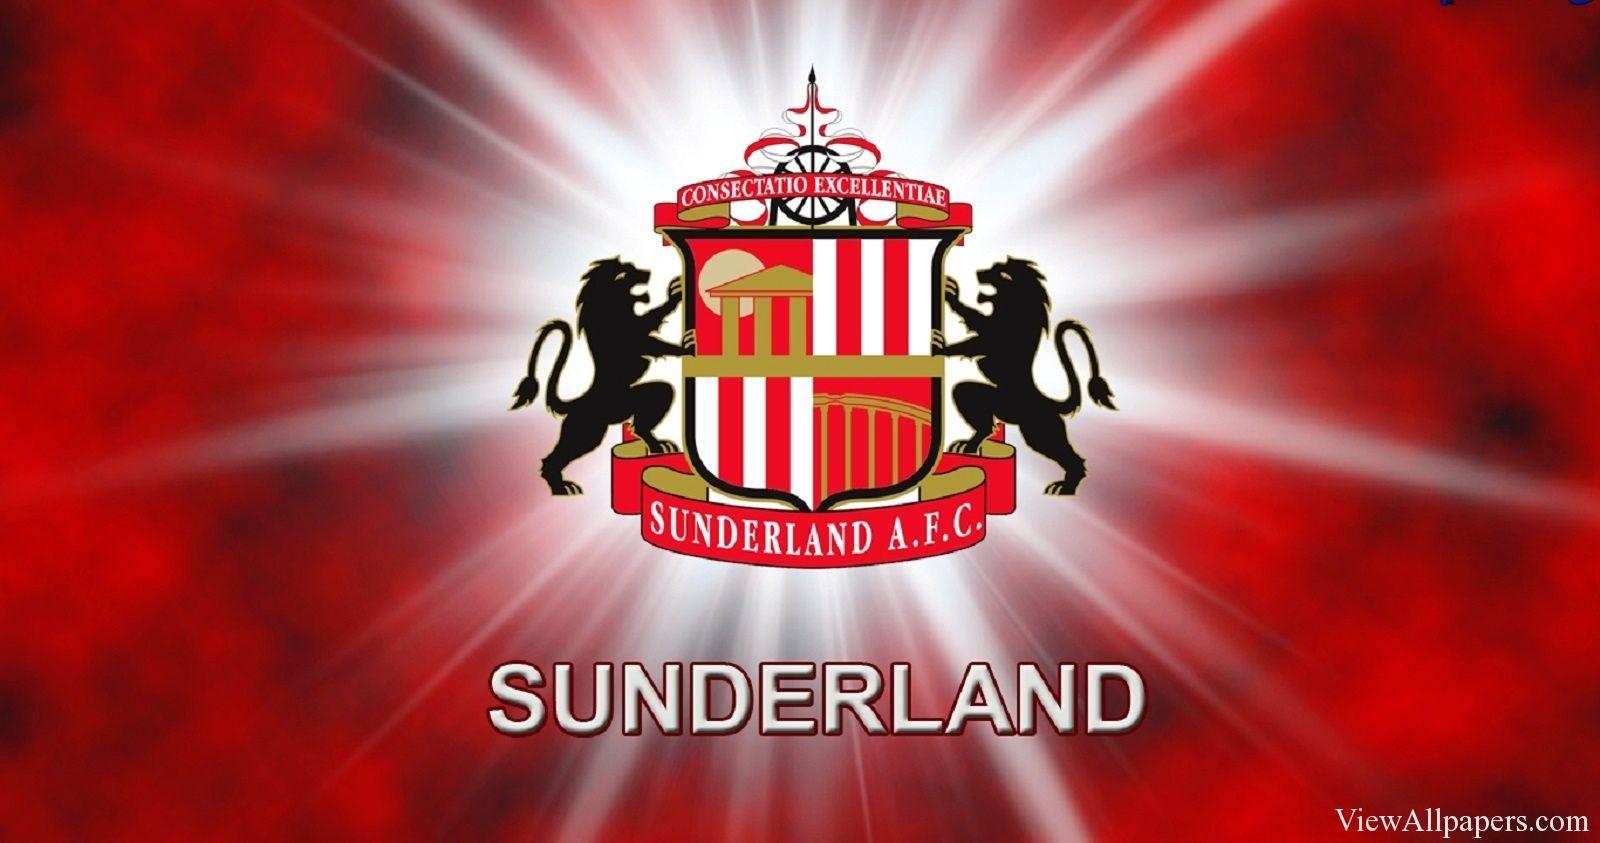 Sunderland AFC Wallpaper Viewallpapers Sunderland afc Cookies 1600x843